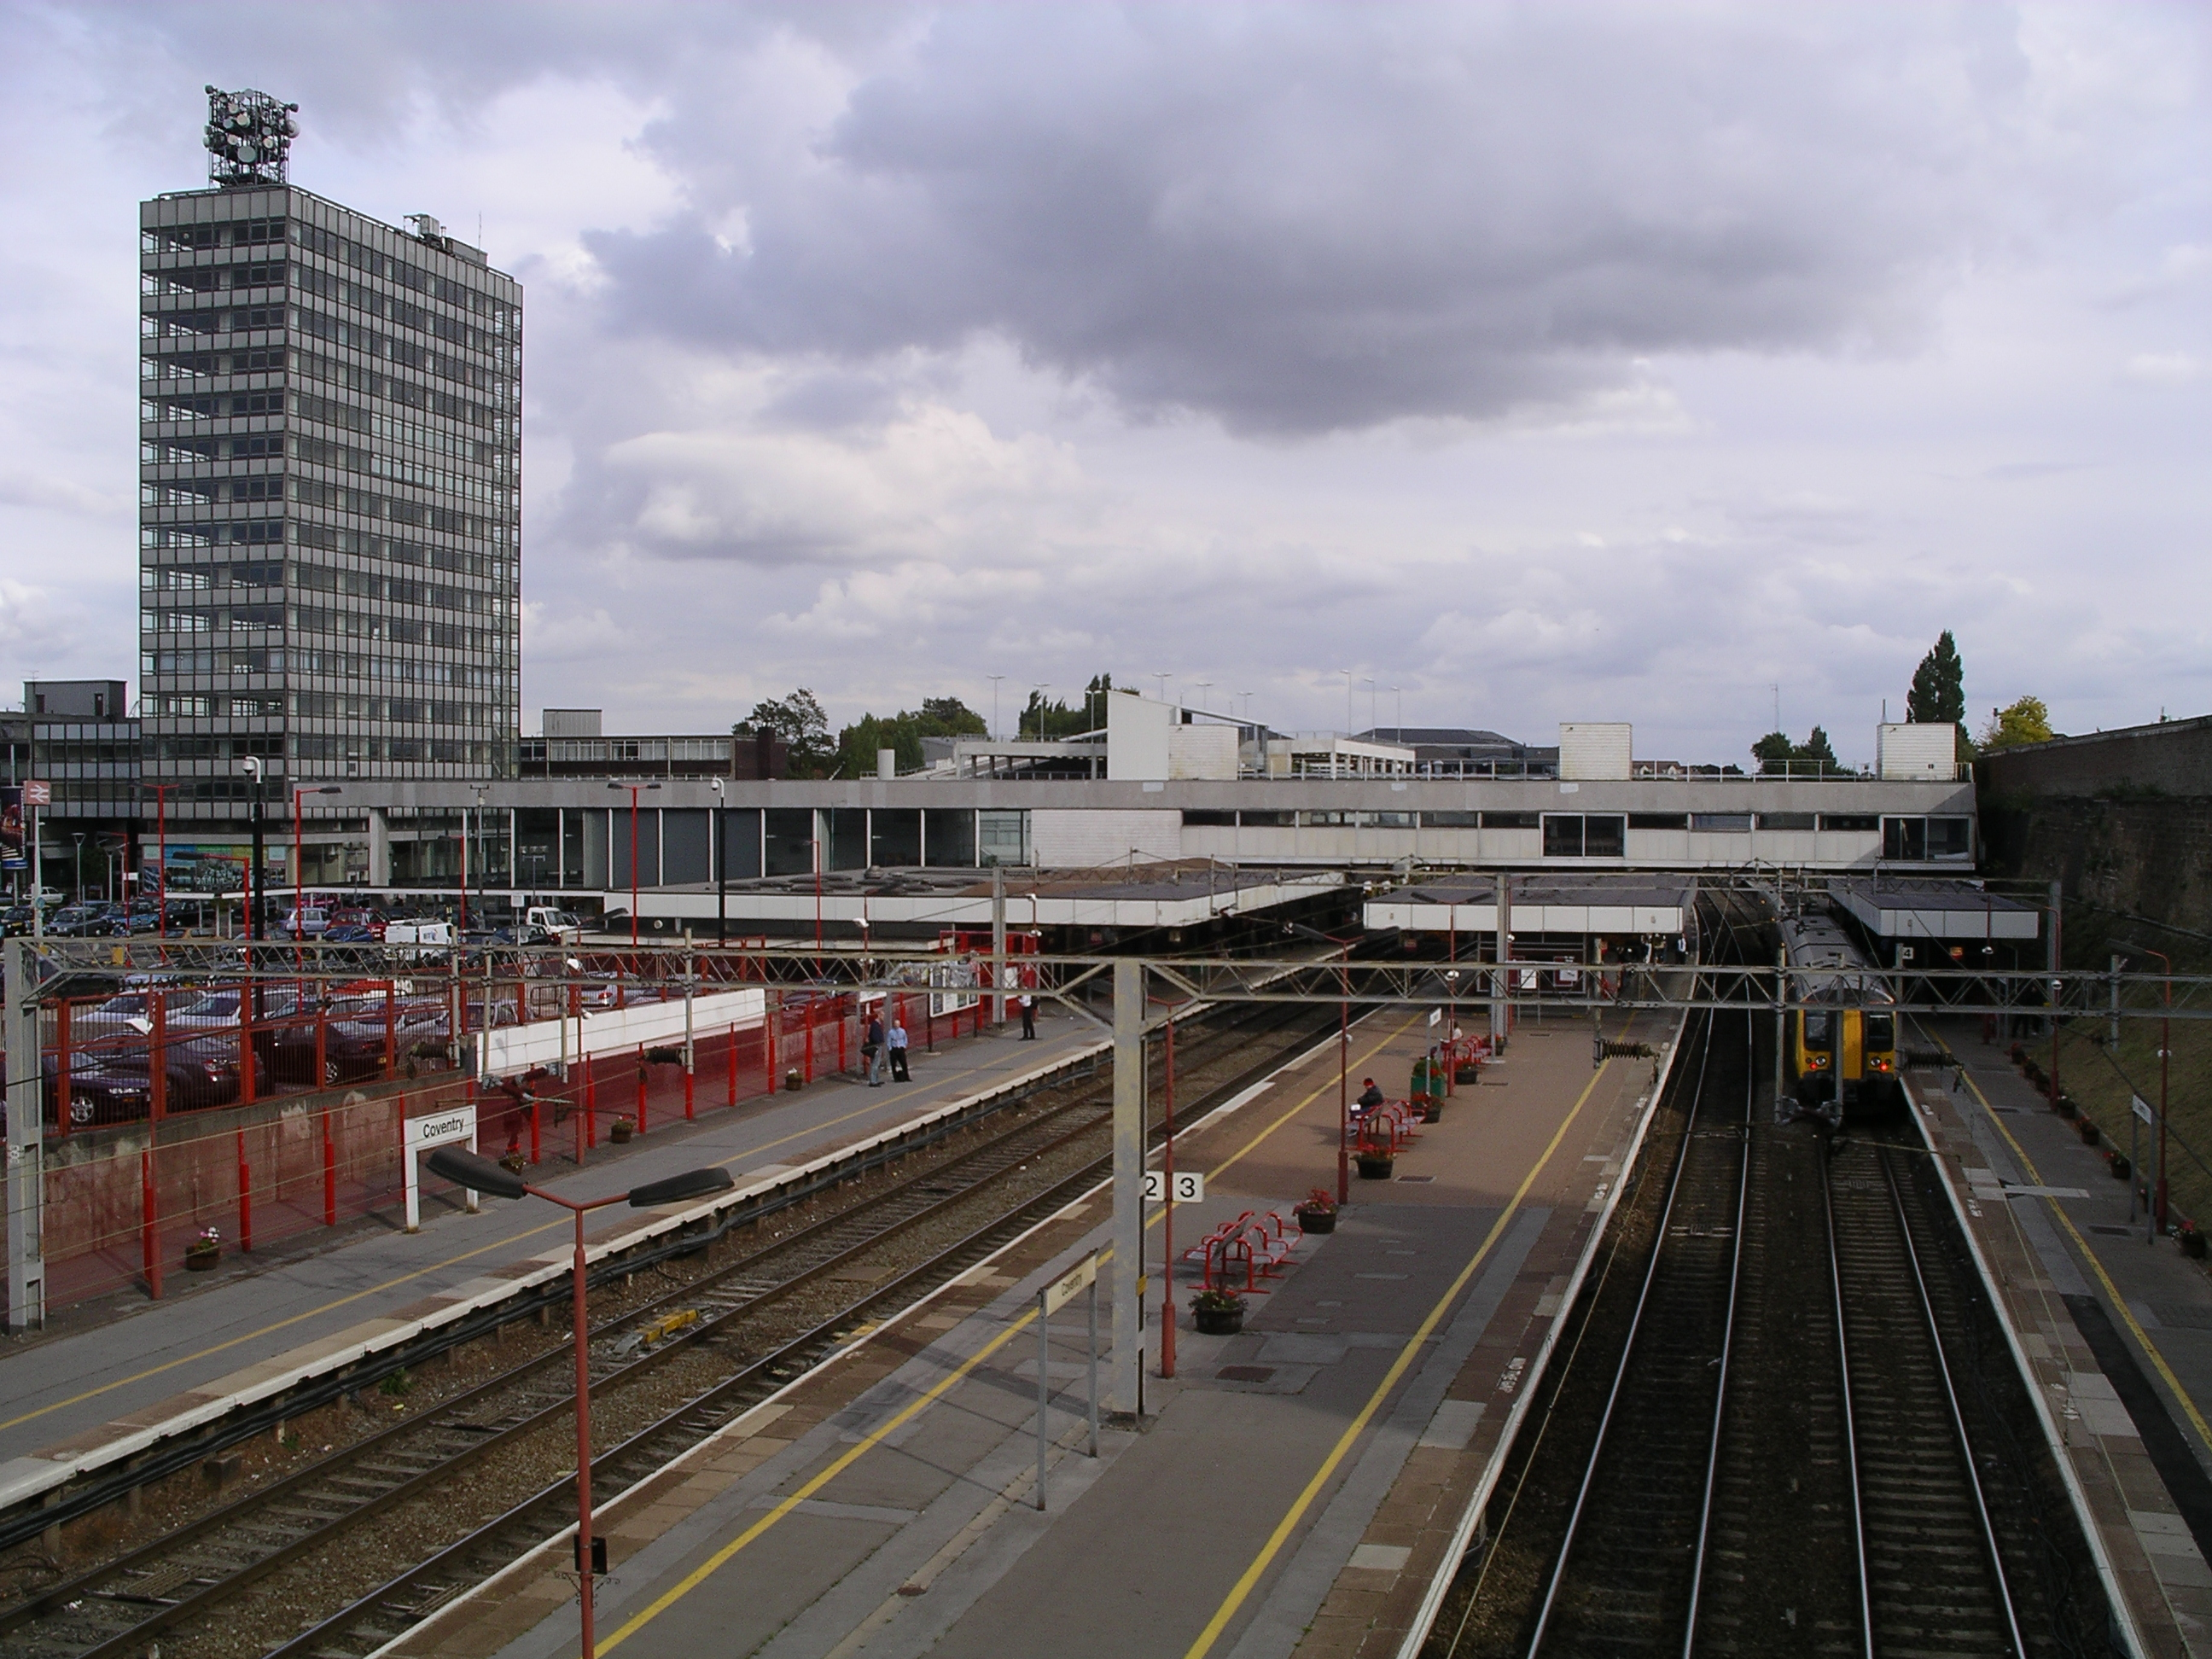 Cov Railway Station 18s07